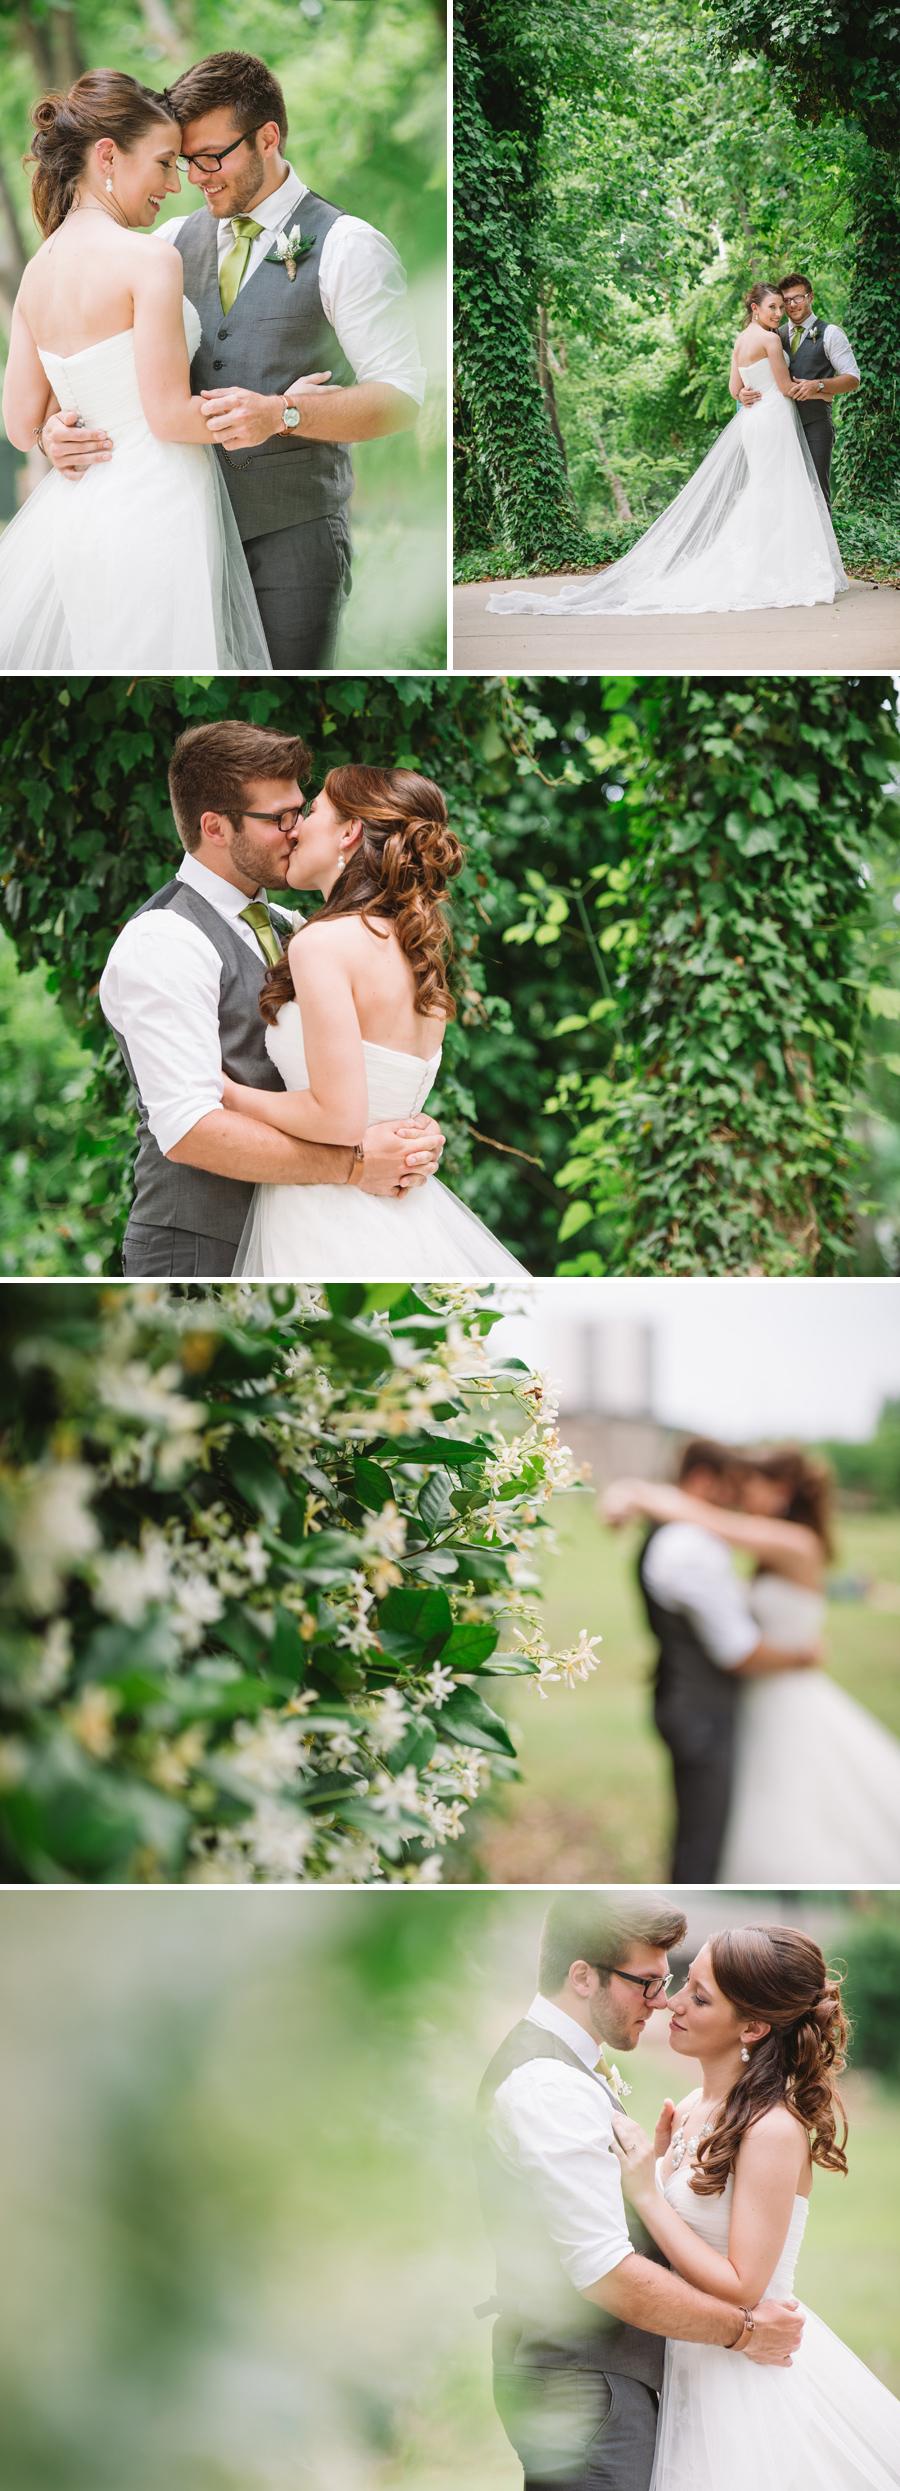 alyssa-hayden-wedding-at-stone-river